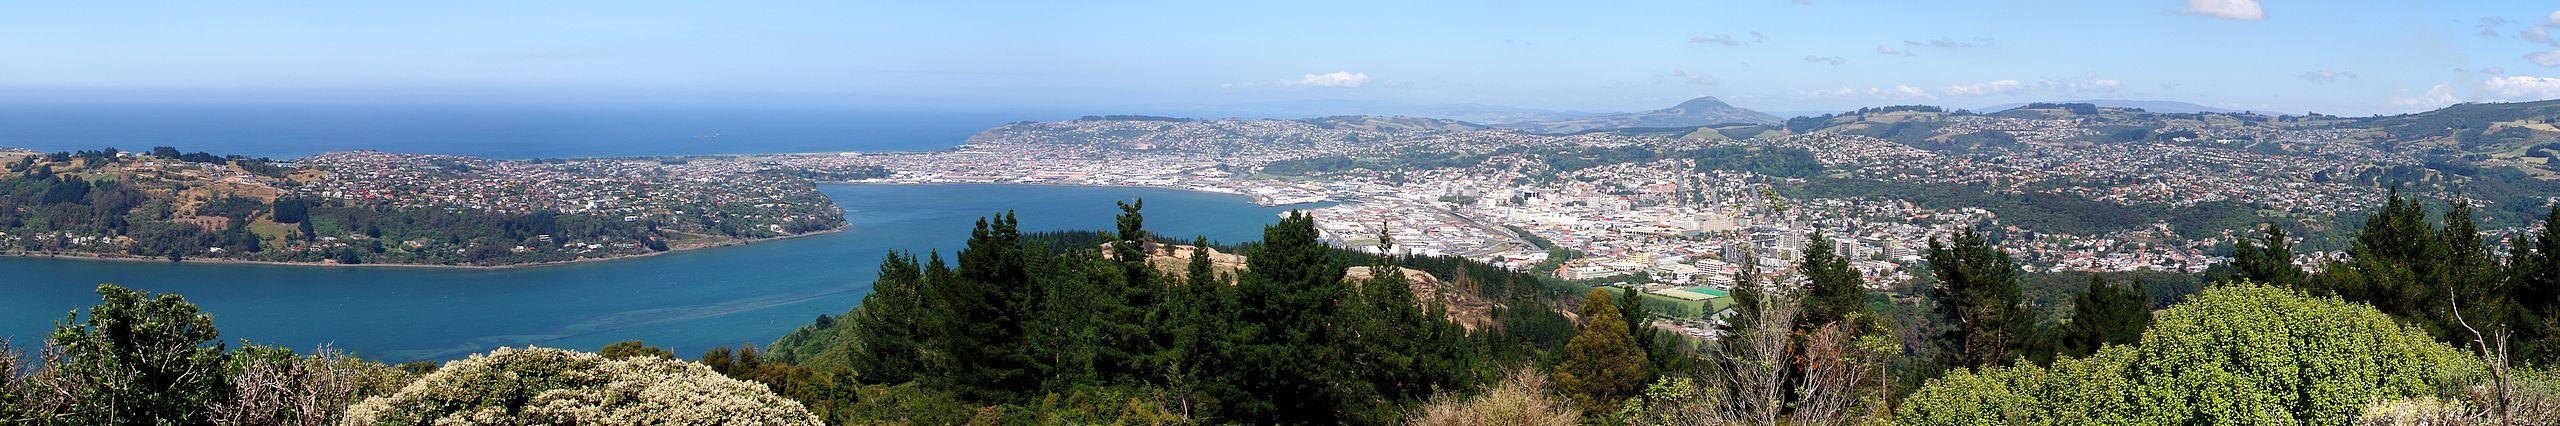 Dunedin pano from signal hillCC BY-SA 3.0 Deanpemberton